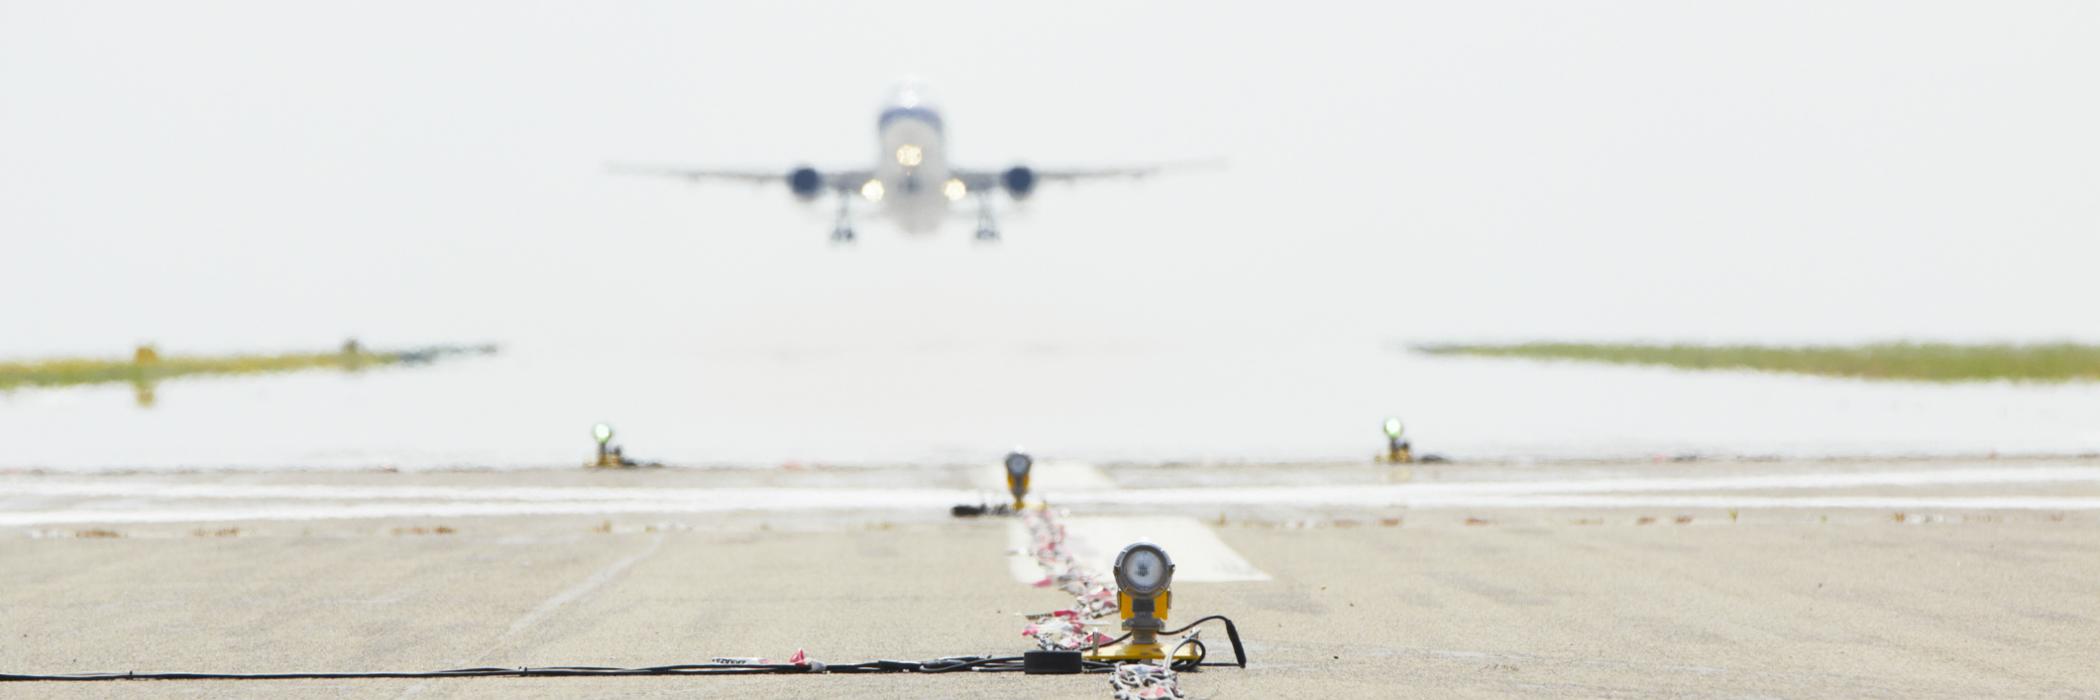 Plane landing on hot runway